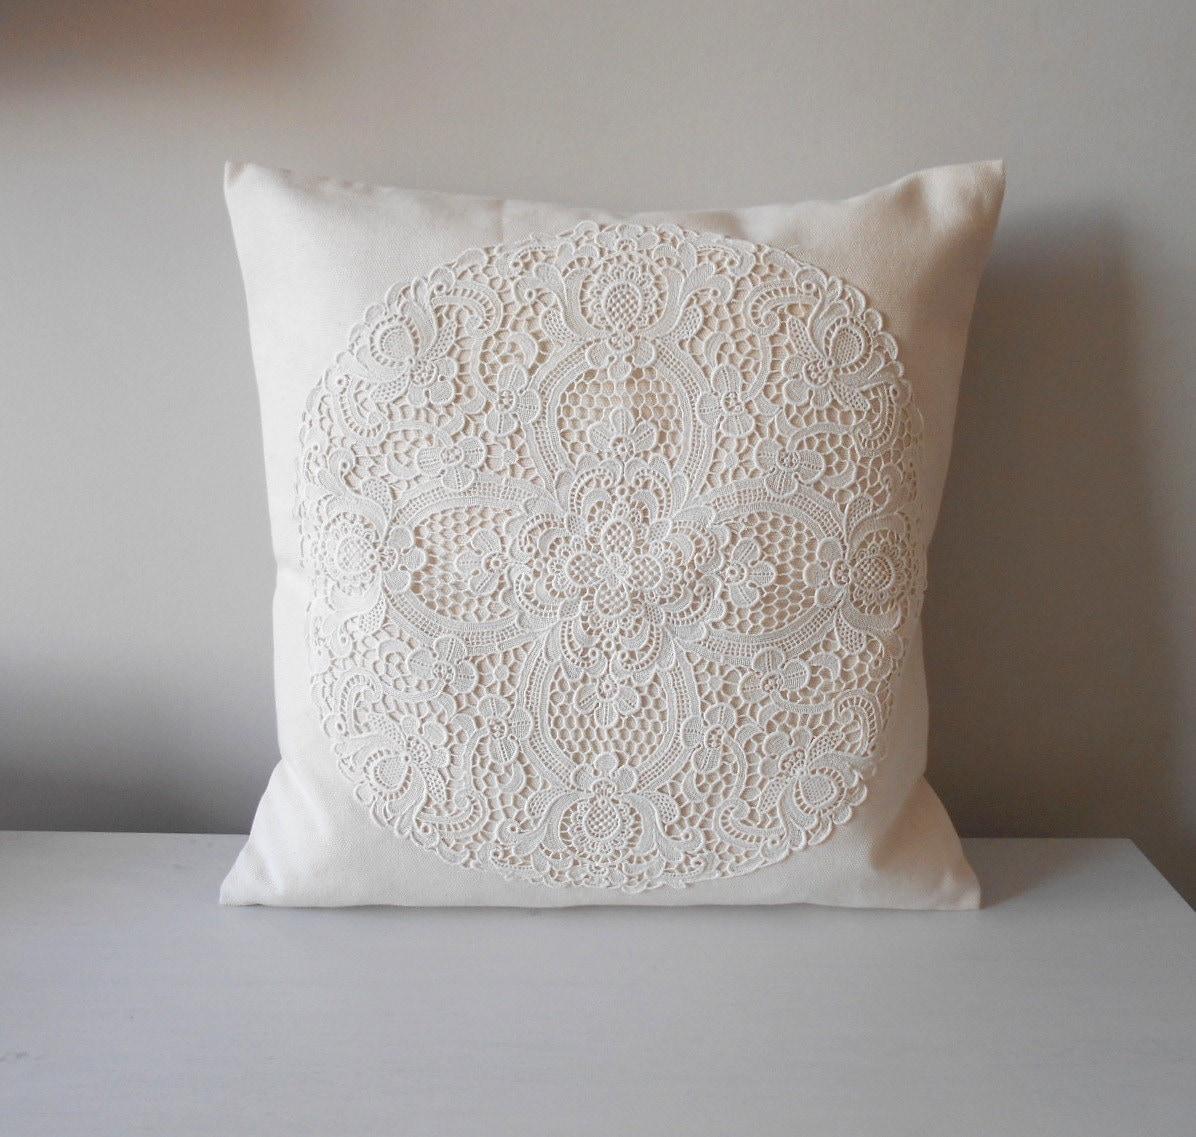 Shabby Chic White Throw Pillows : Creamy White Pillow Cover Shabby Chic Pillow French Country